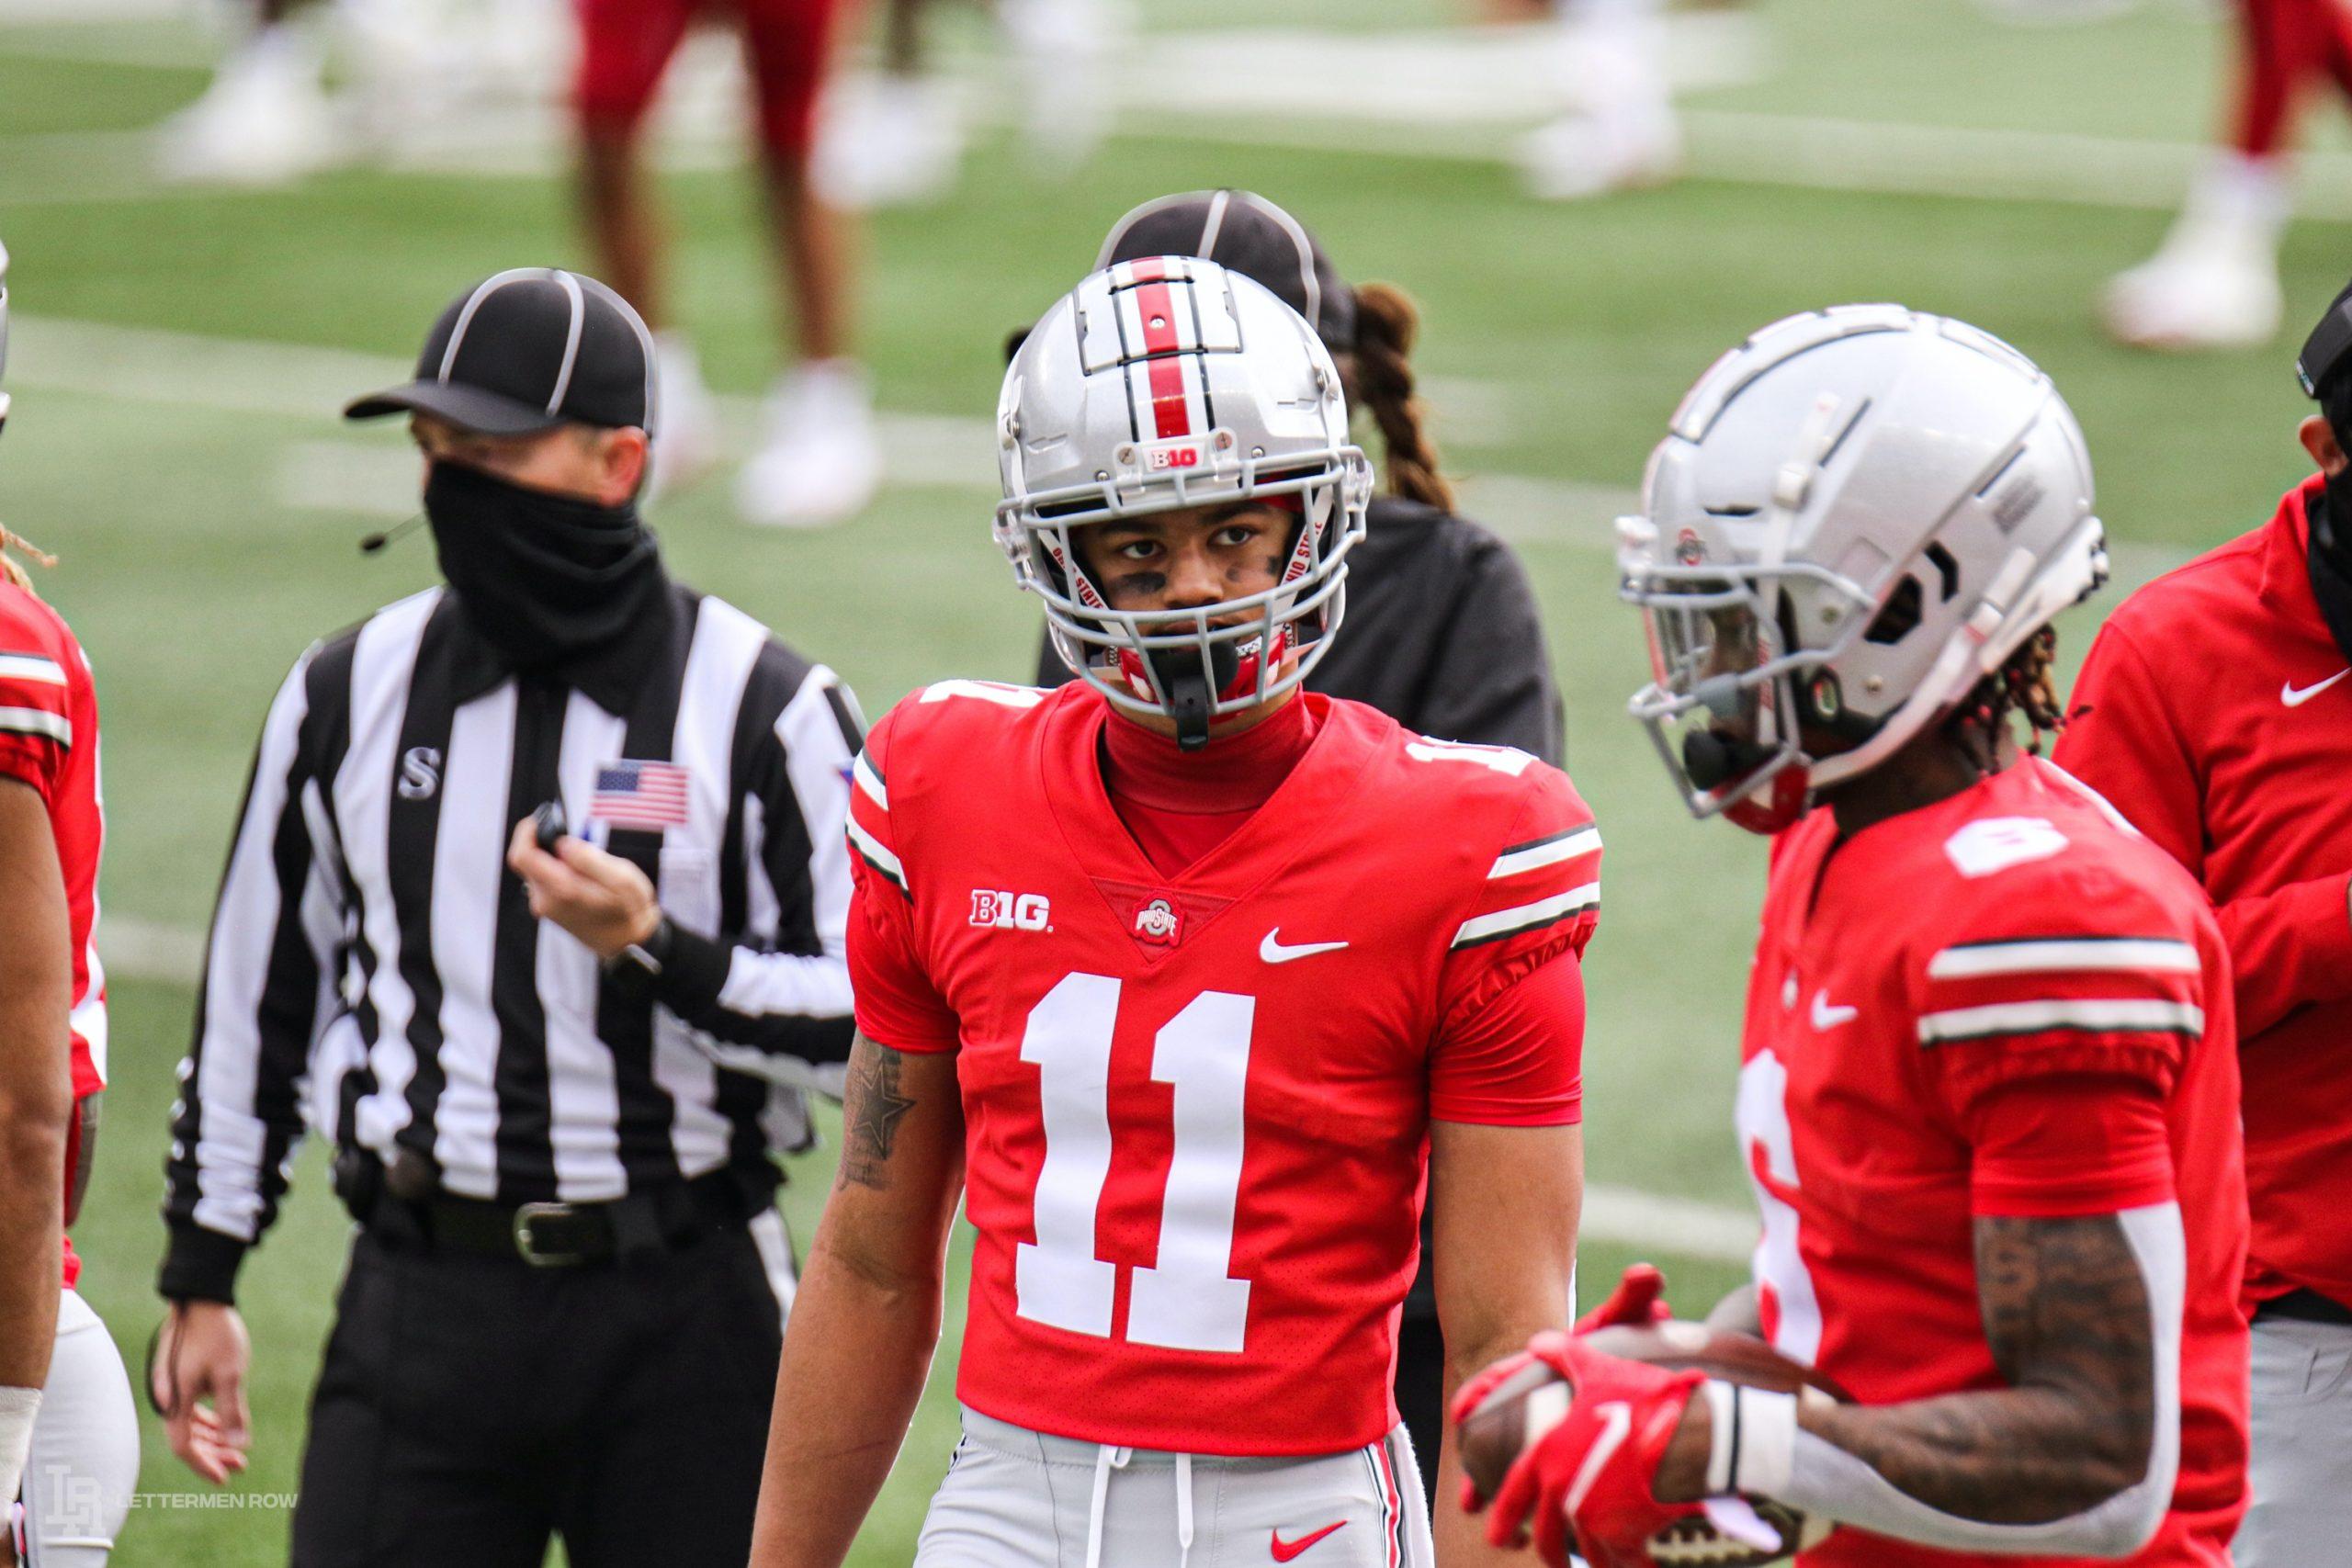 Jaxon Smith-Njigba-Ohio State-Ohio State football-Buckeyes